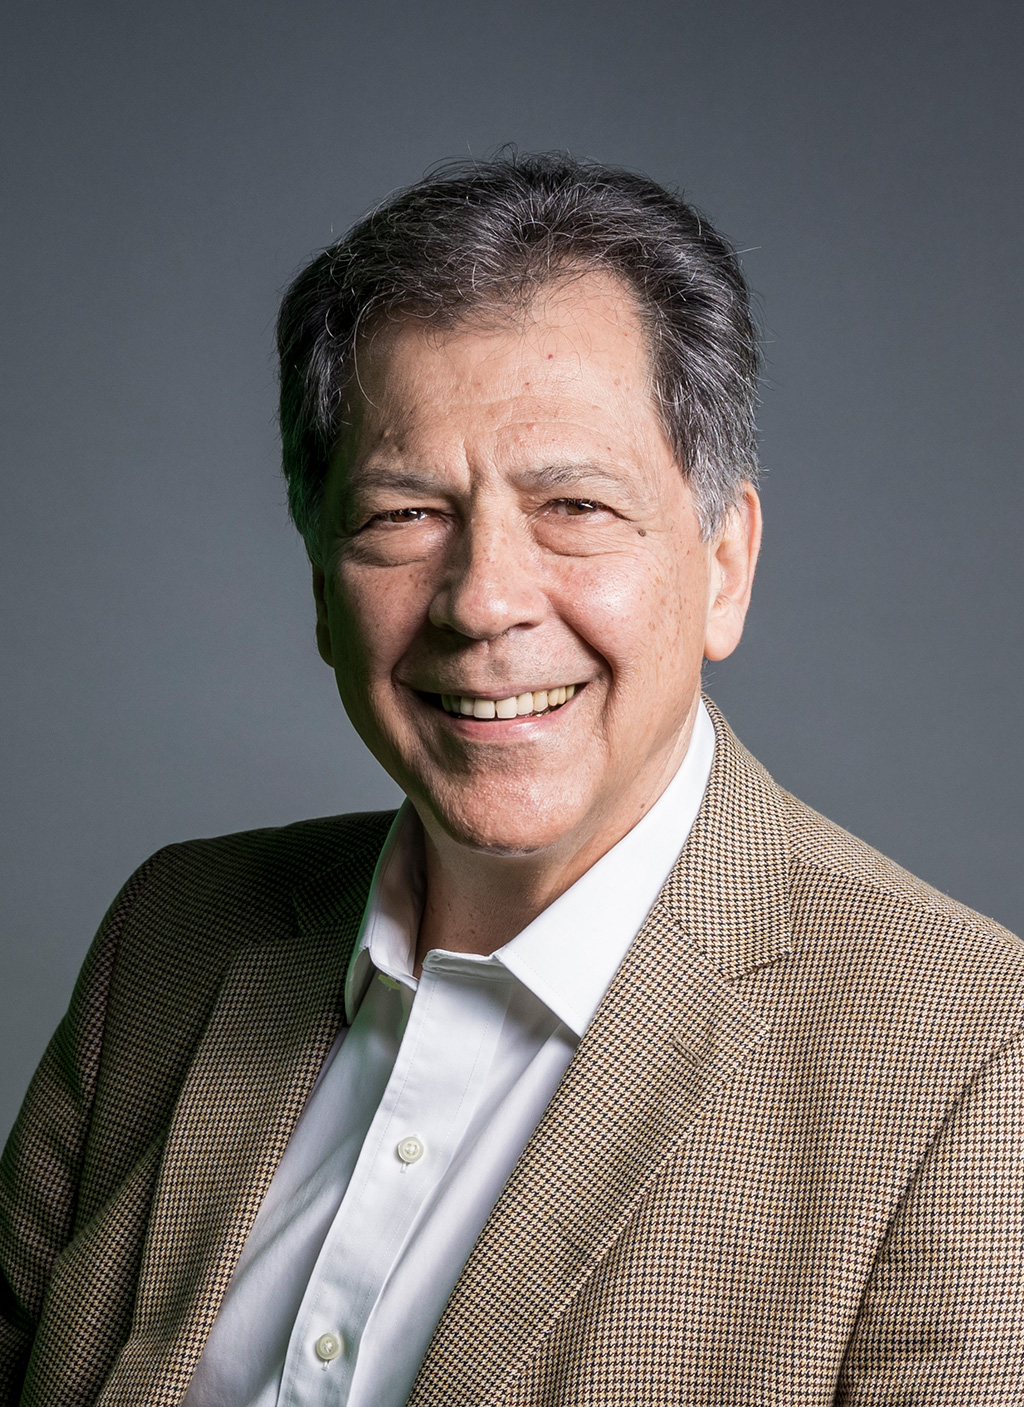 Joel Souza Dutra fala sobre como o gestor deve agir - Revista Shopping Centers